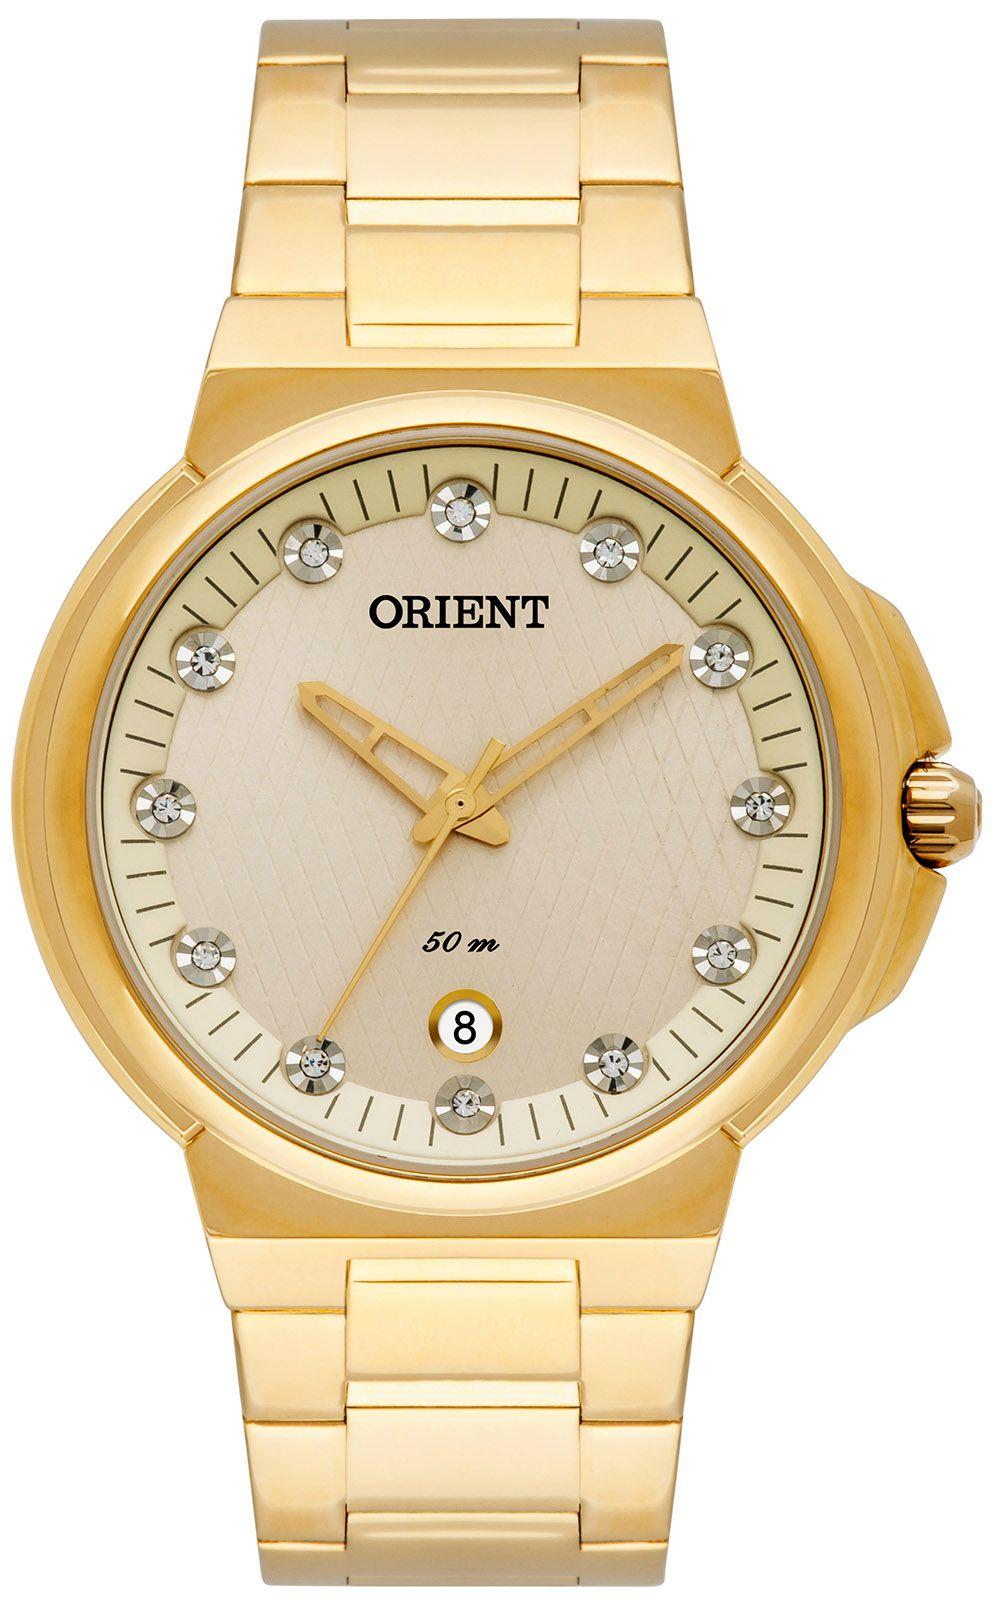 6250124f62 Relógio Orient Feminino FGSS1129-C1KX Dourado - PATRICIA JOIAS